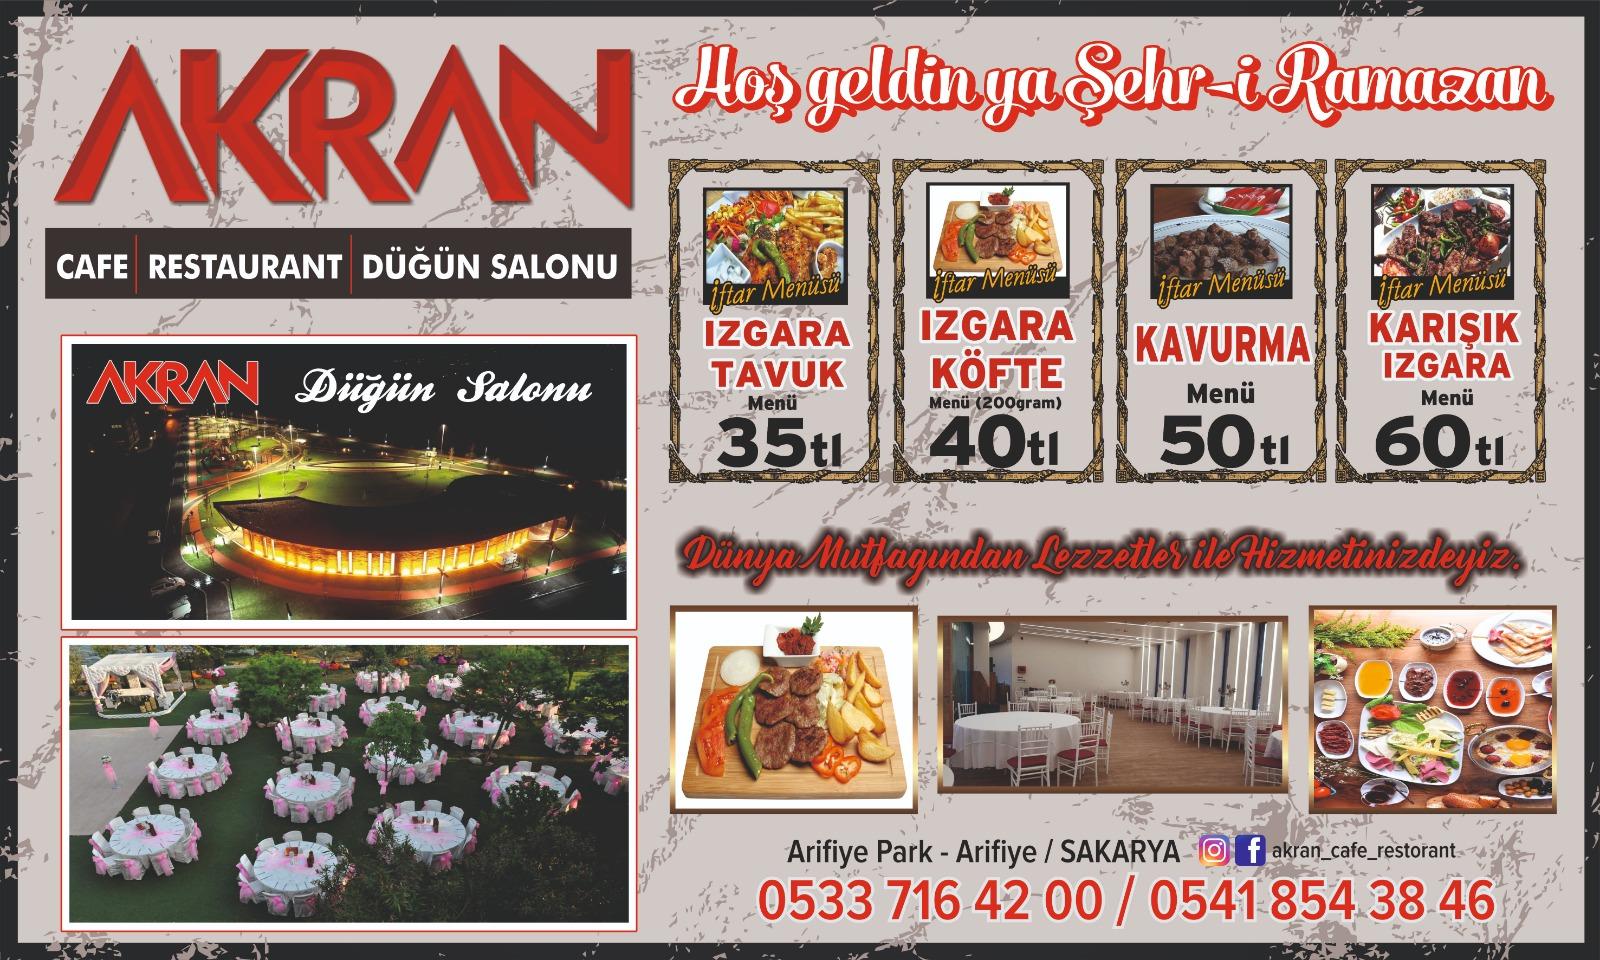 AKRAN CAFE'DE ZENGİN İFTAR MENÜLERİ